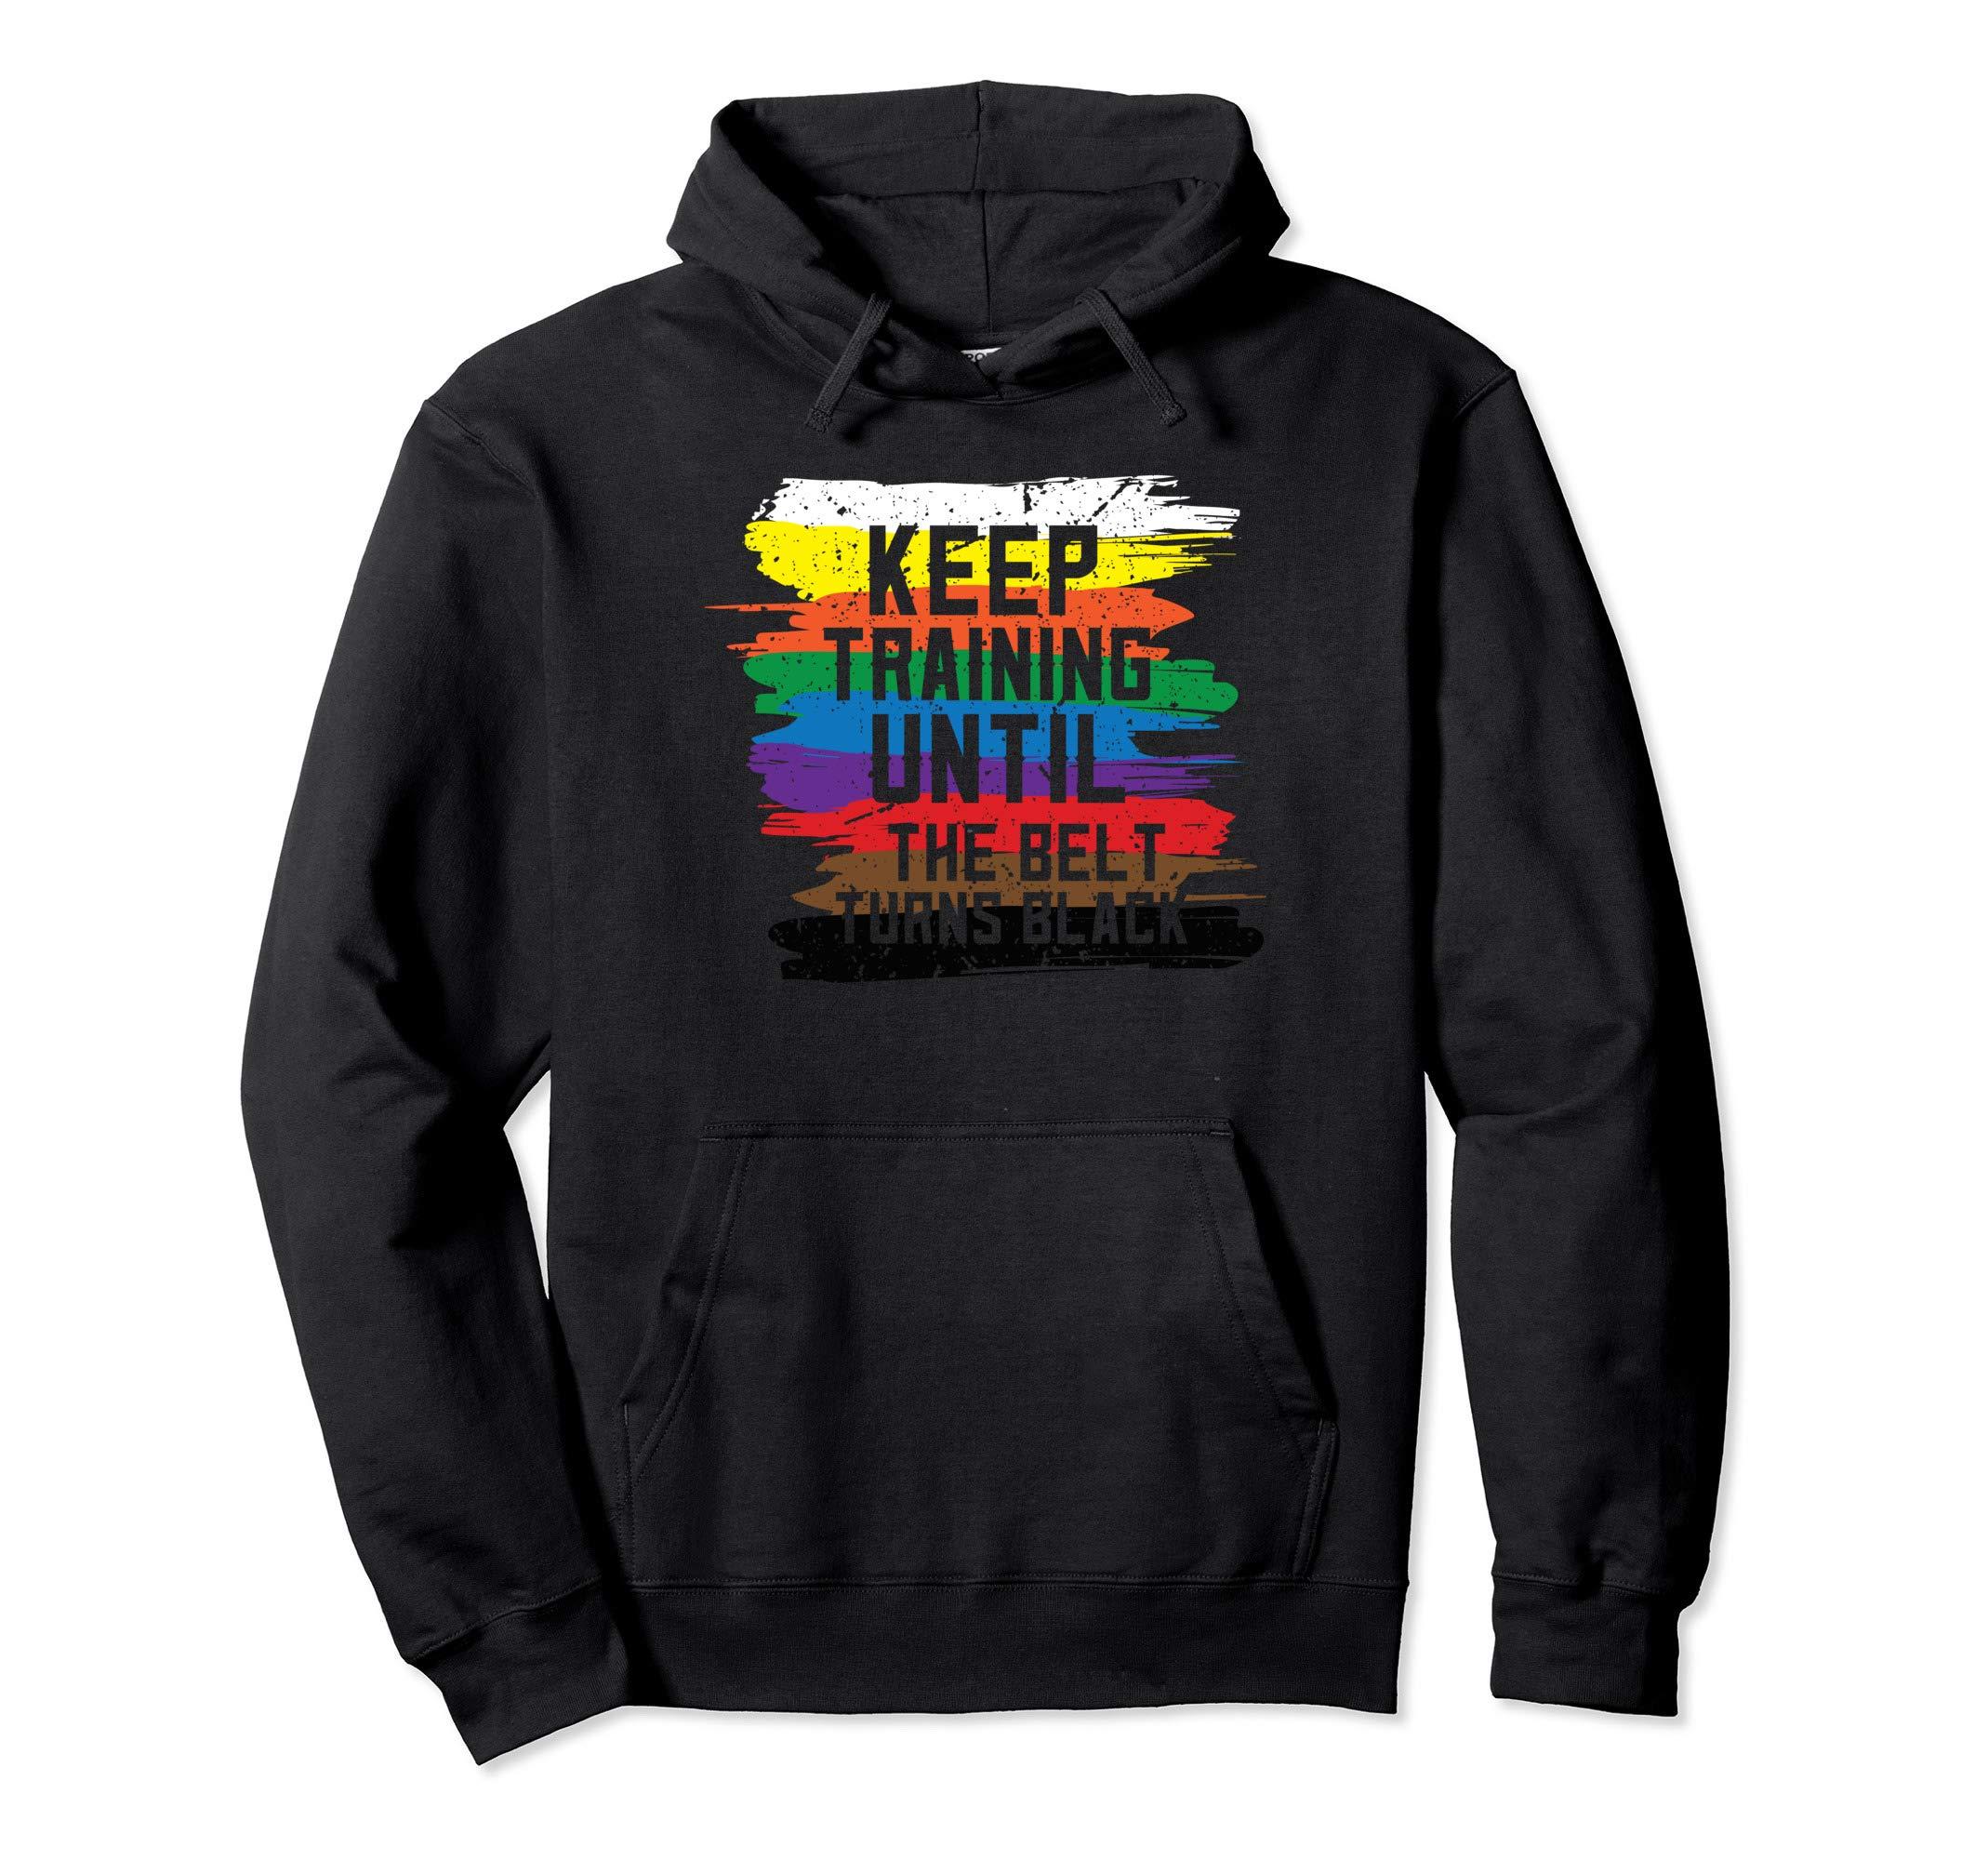 Black Belt Martial Art Training Karate Tae Kwon Do Pullover Hoodie by InGENIUS Martial Arts Shirts